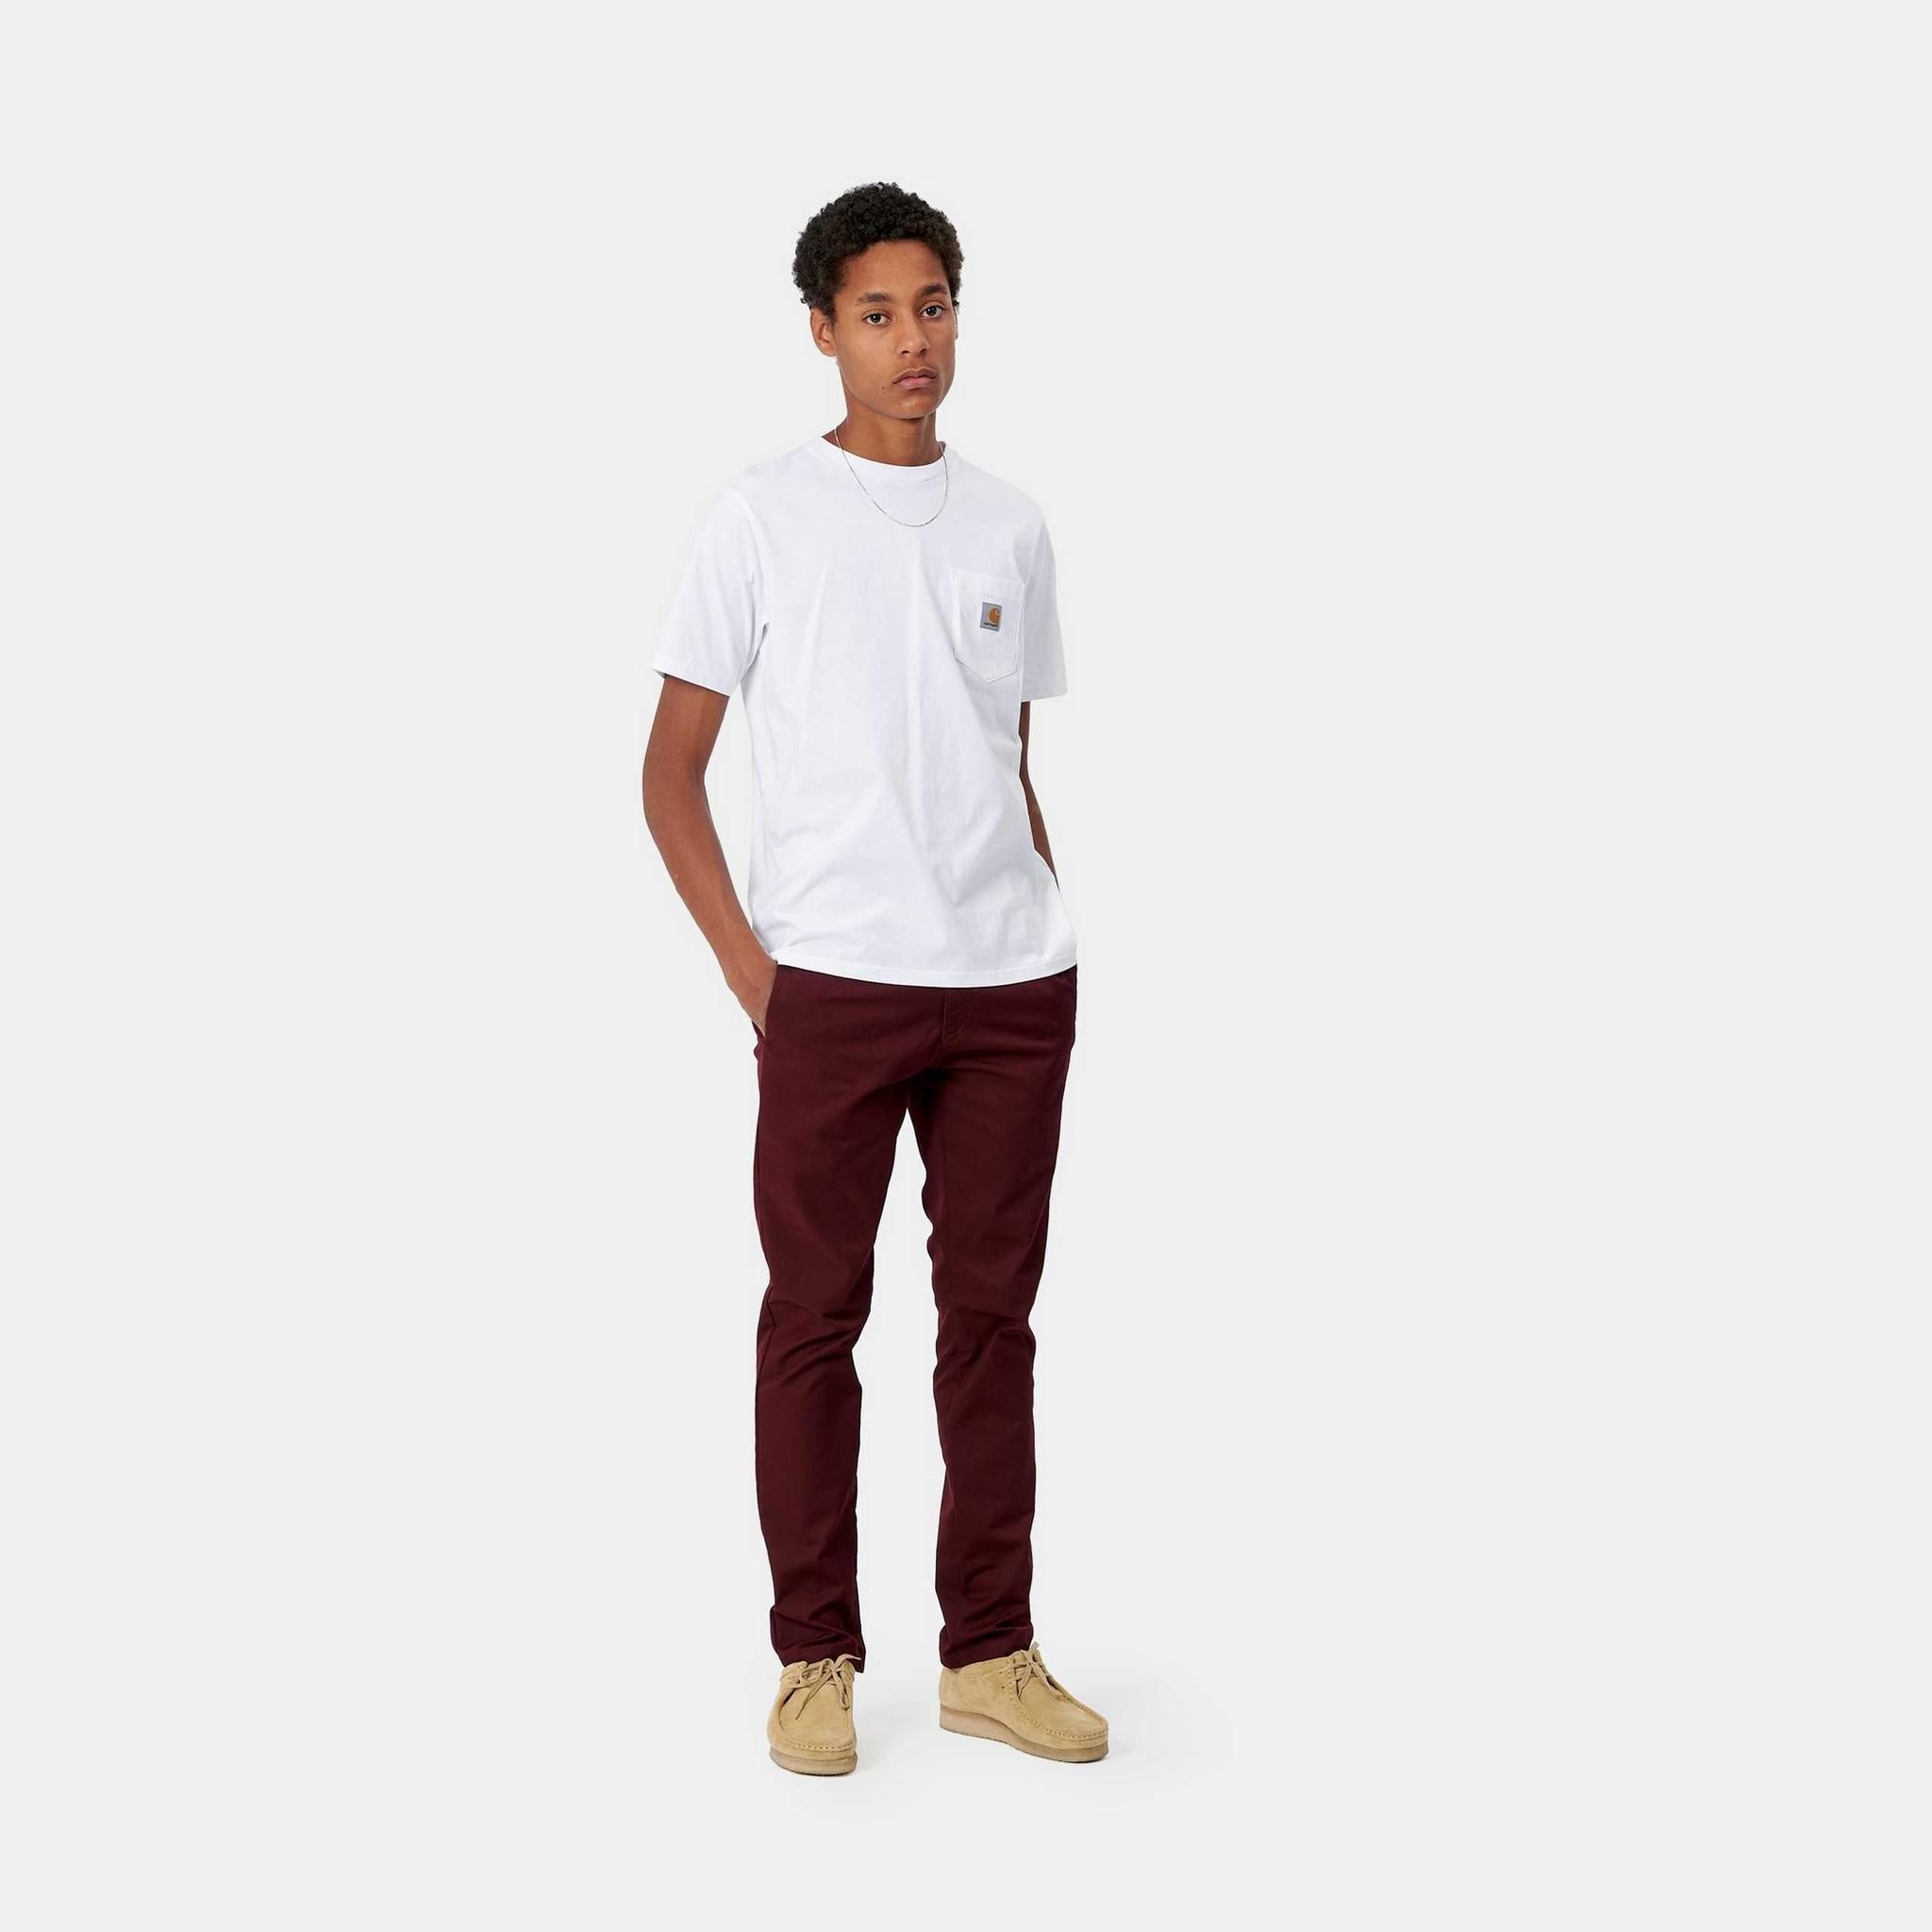 Carhartt Carhartt S/S Pocket T-Shirt